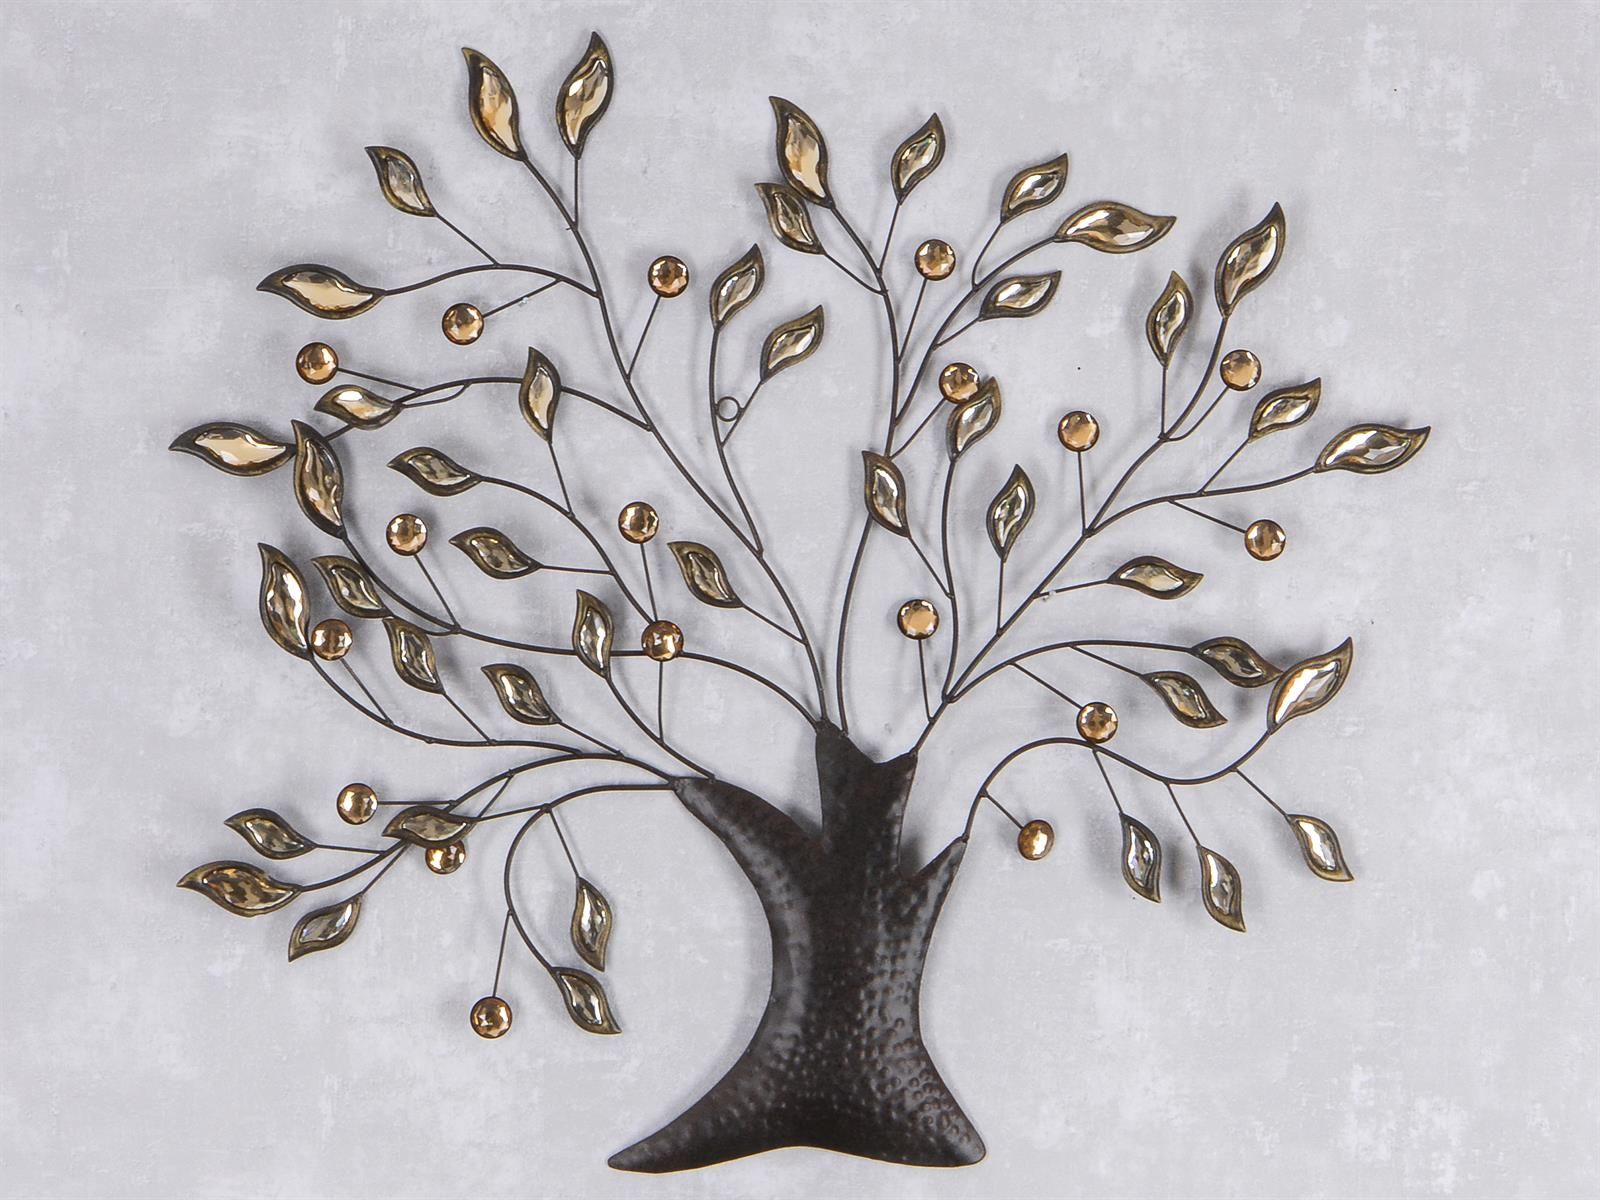 WAND DEKO Baum   Blätter Amber Aus Metall Breite 80cm Höhe 72cm    Dunkelbraun